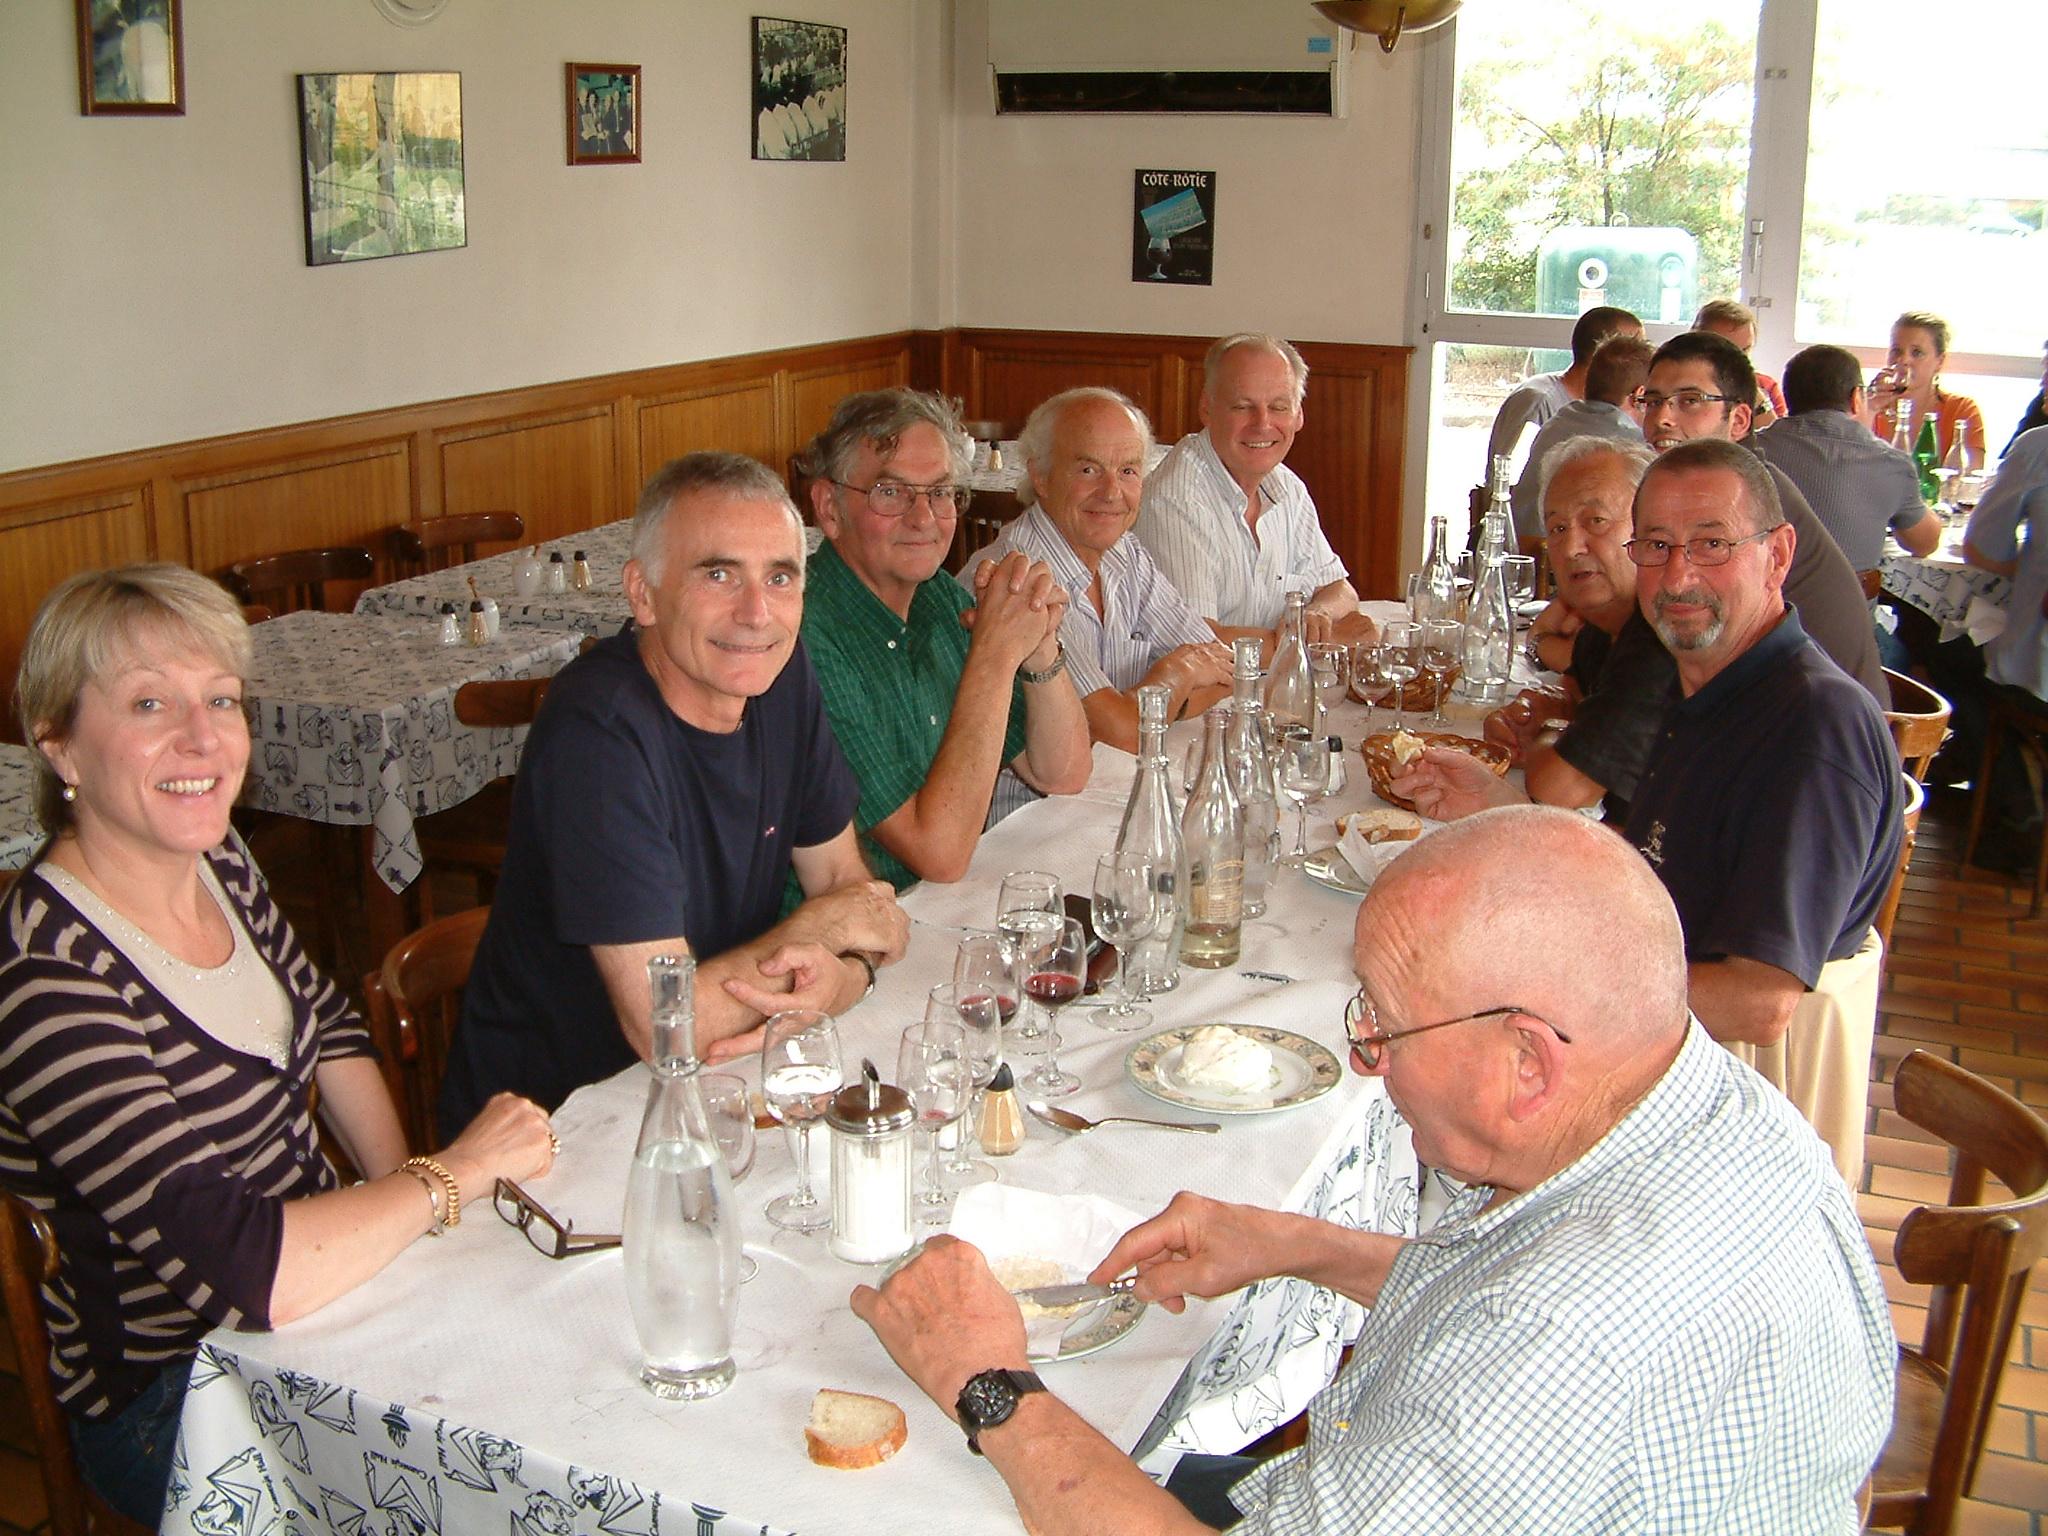 2011-08-03-064_galealc